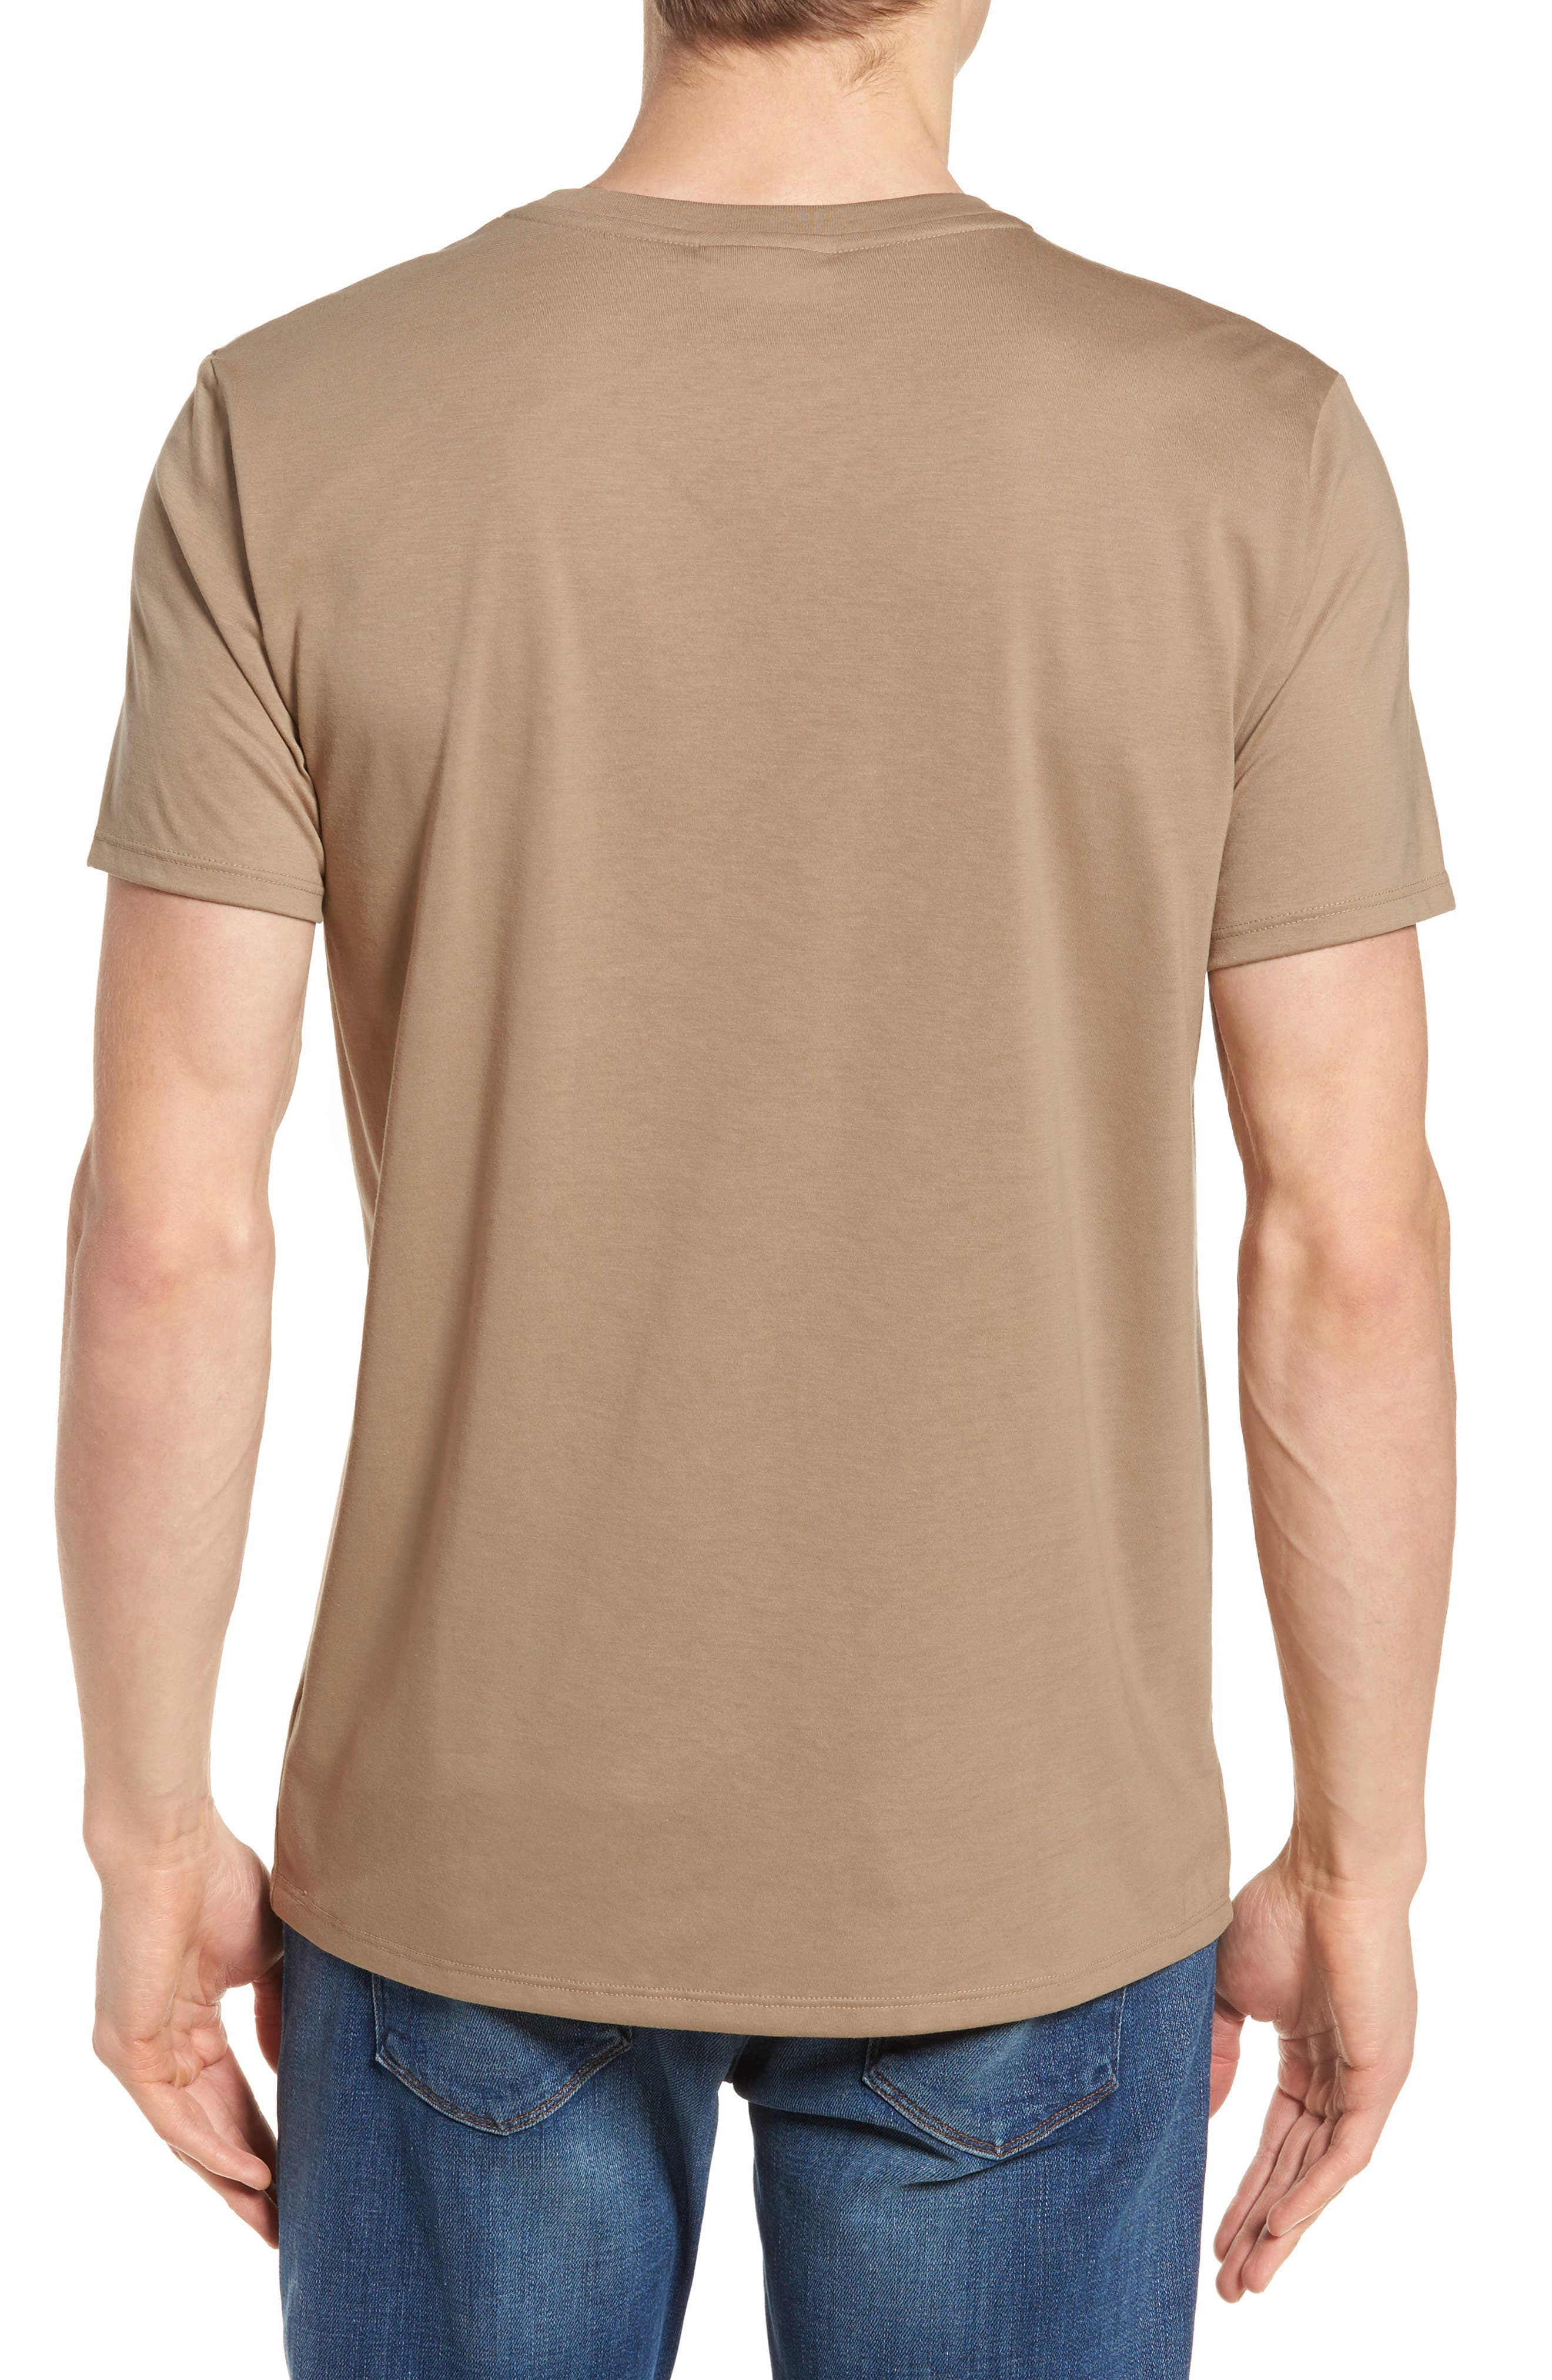 Pima Cotton T-Shirt,                             Alternate thumbnail 2, color,                             KRAFT BEIGE